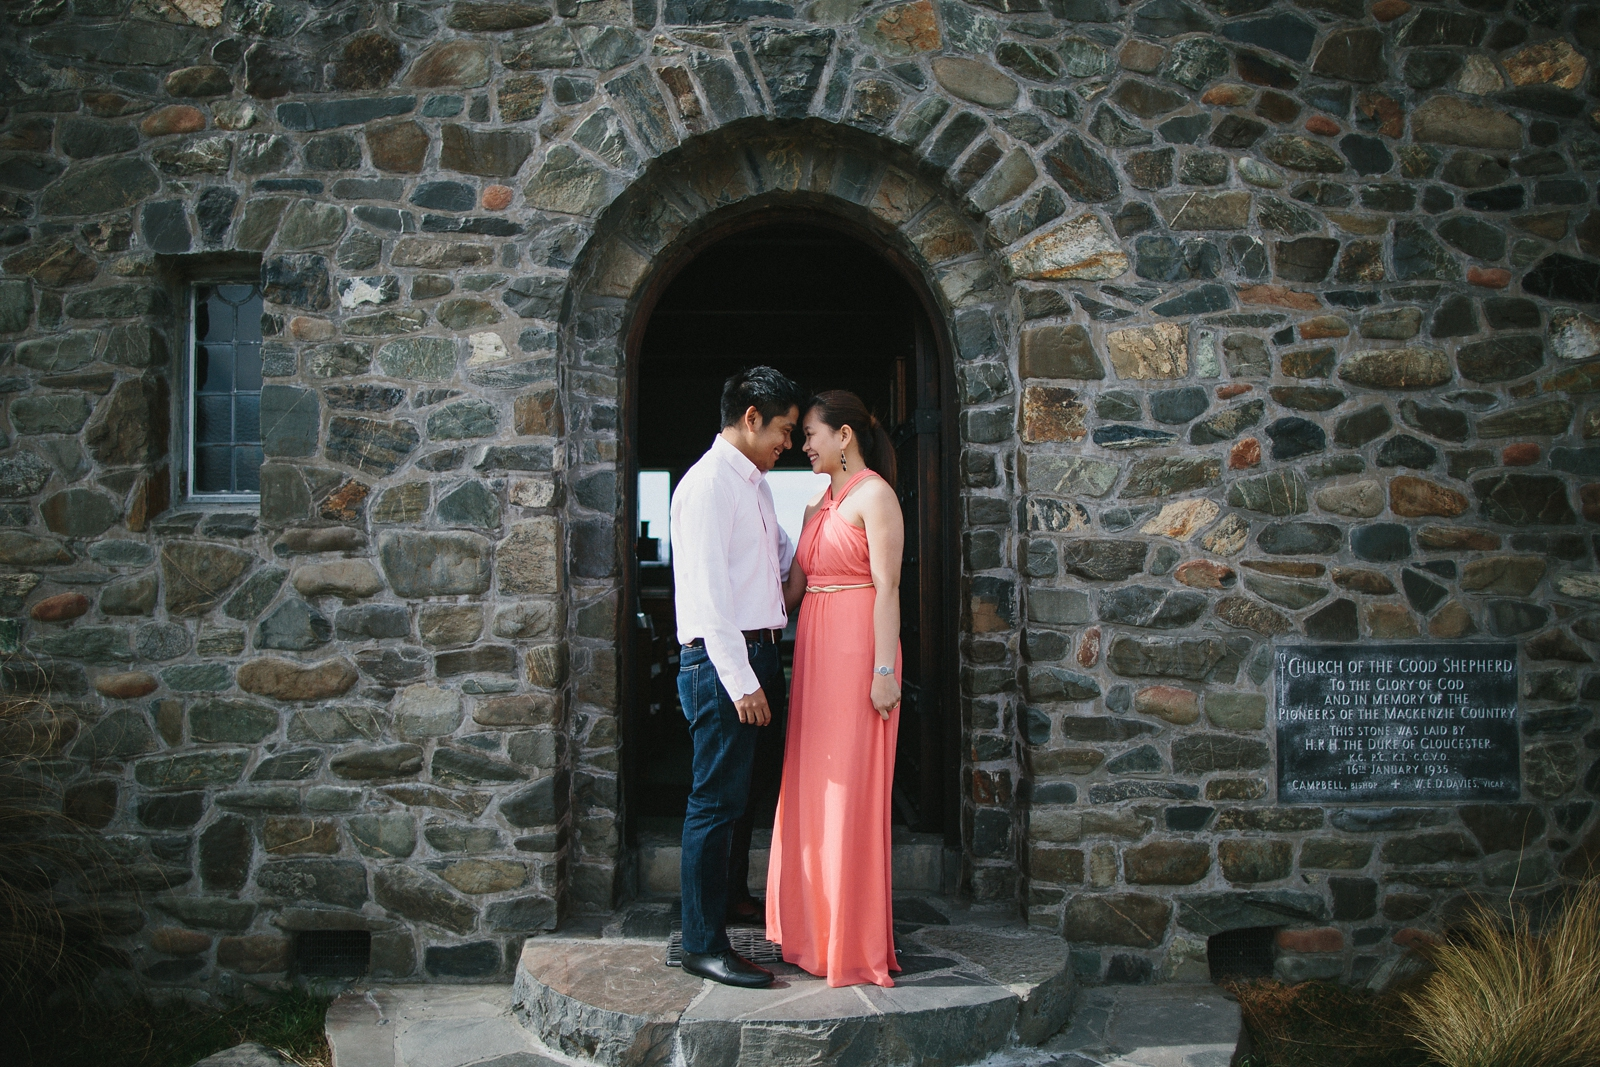 Chrirstchurch Engagement Photographer_Patty Lagera_0031.jpg